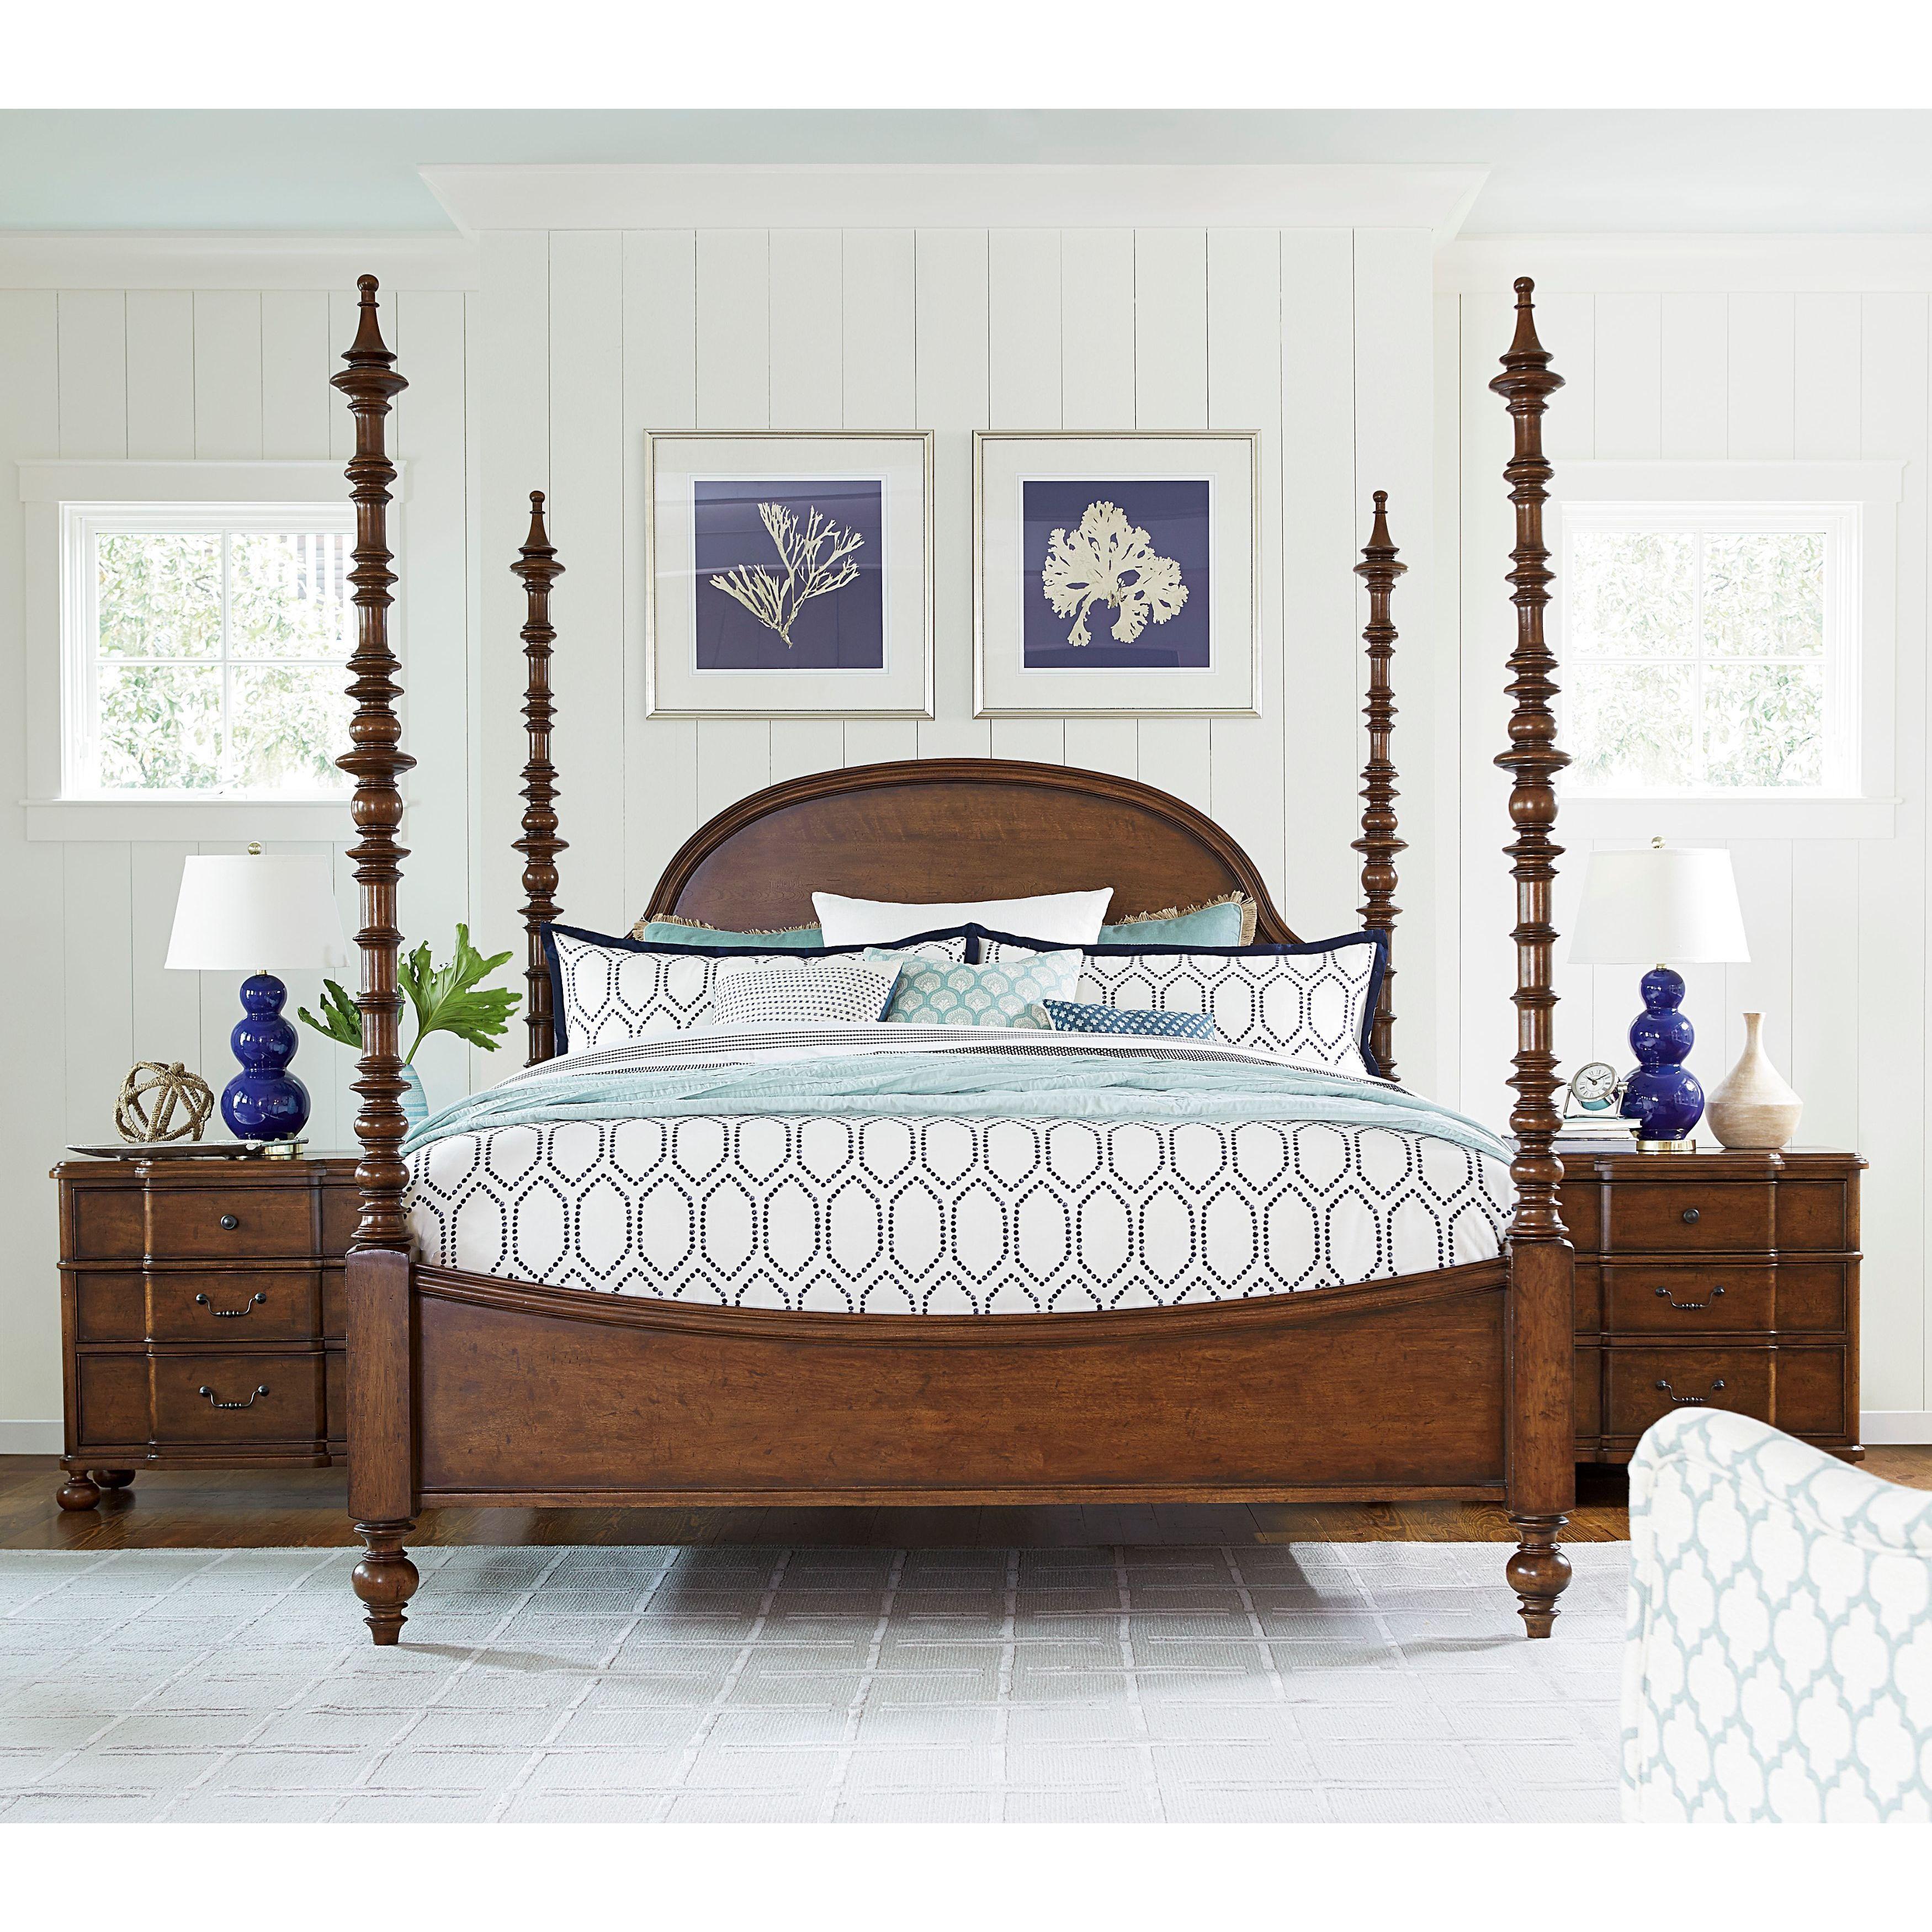 PAULA Deen Dogwood Bed Complete in Low Tide Finish (King)...